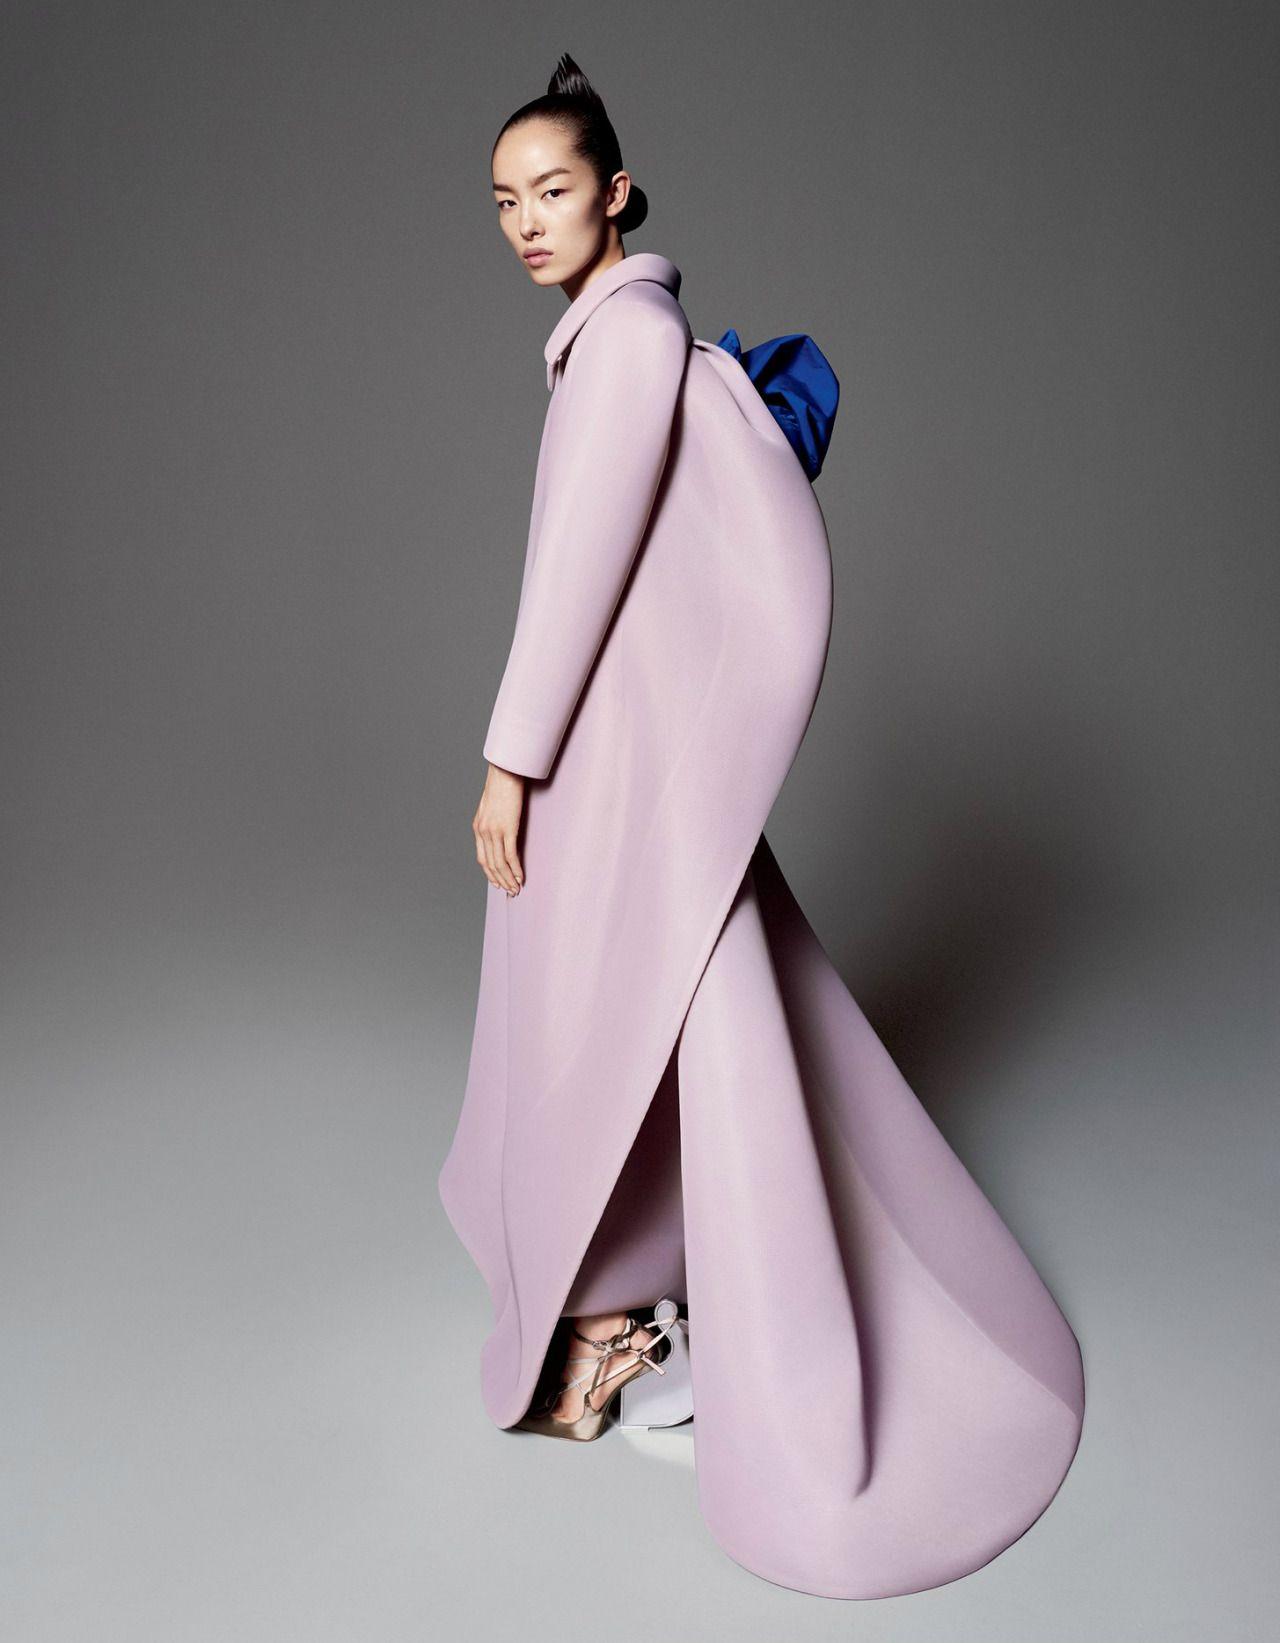 Robertocustodioart Fei Fei Sun By David Sims 2015 Sculptural Fashion Fashion Today Fashion Photography